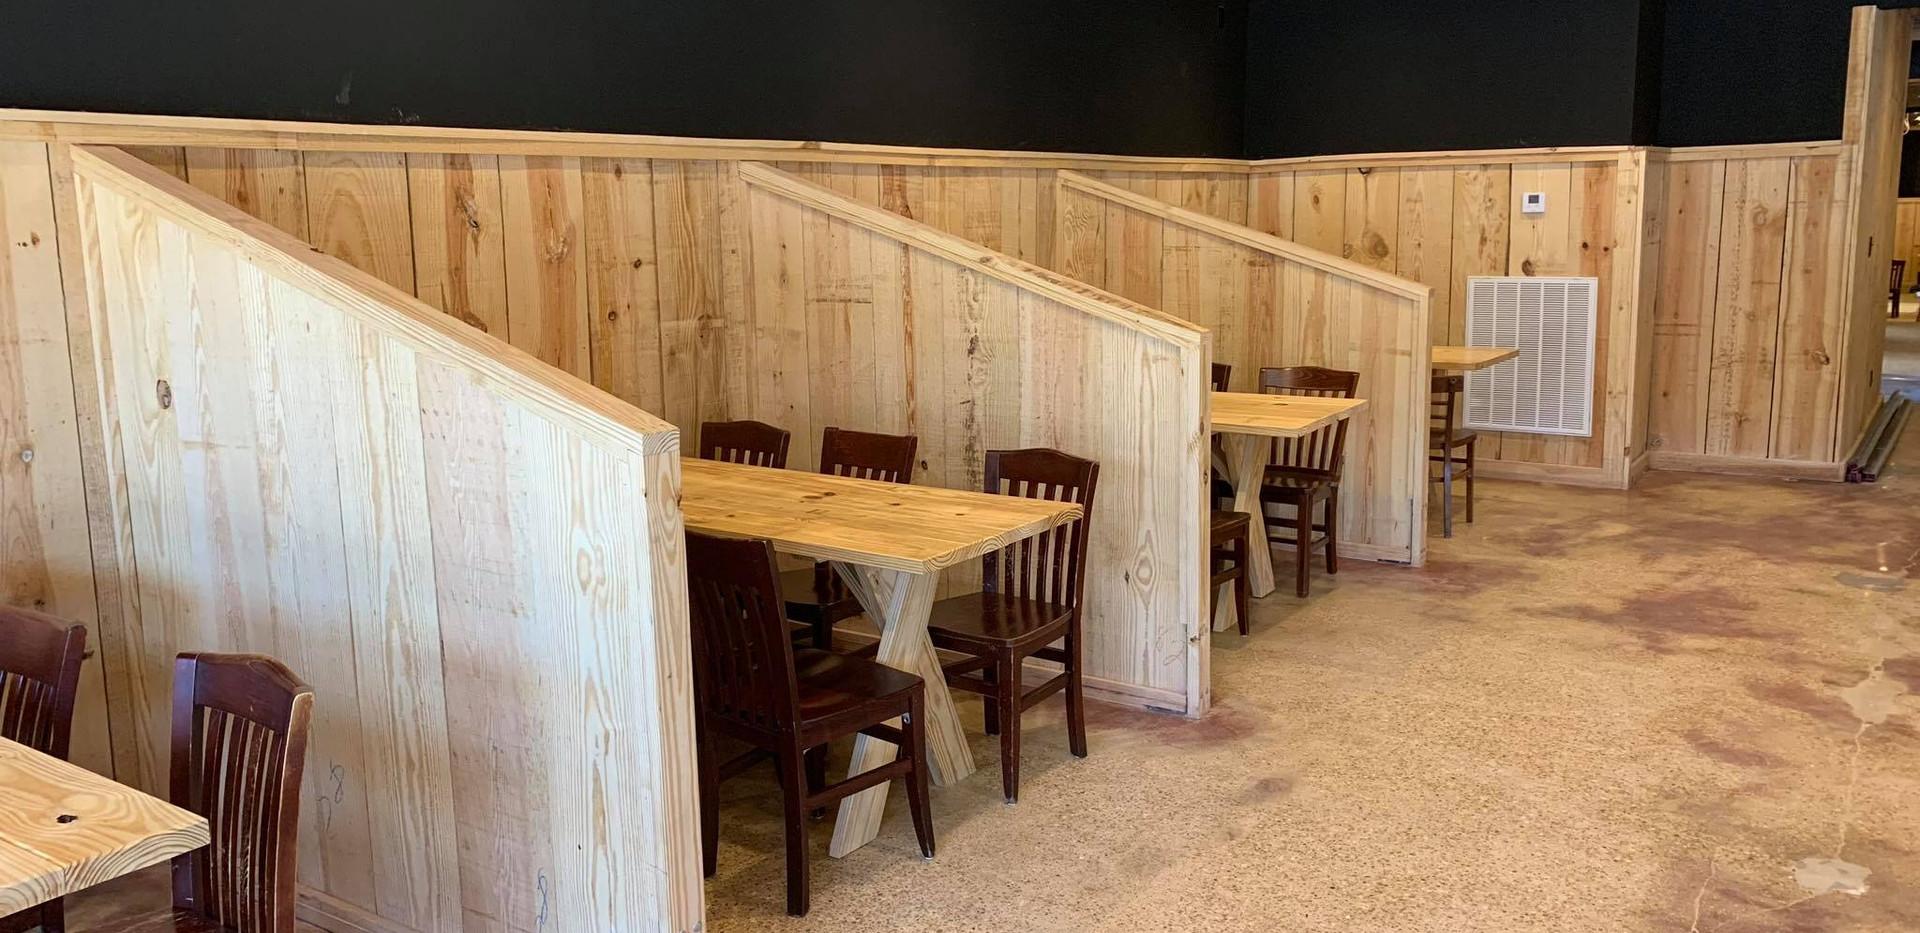 Big Mikes Steakhouse- Moundville, AL